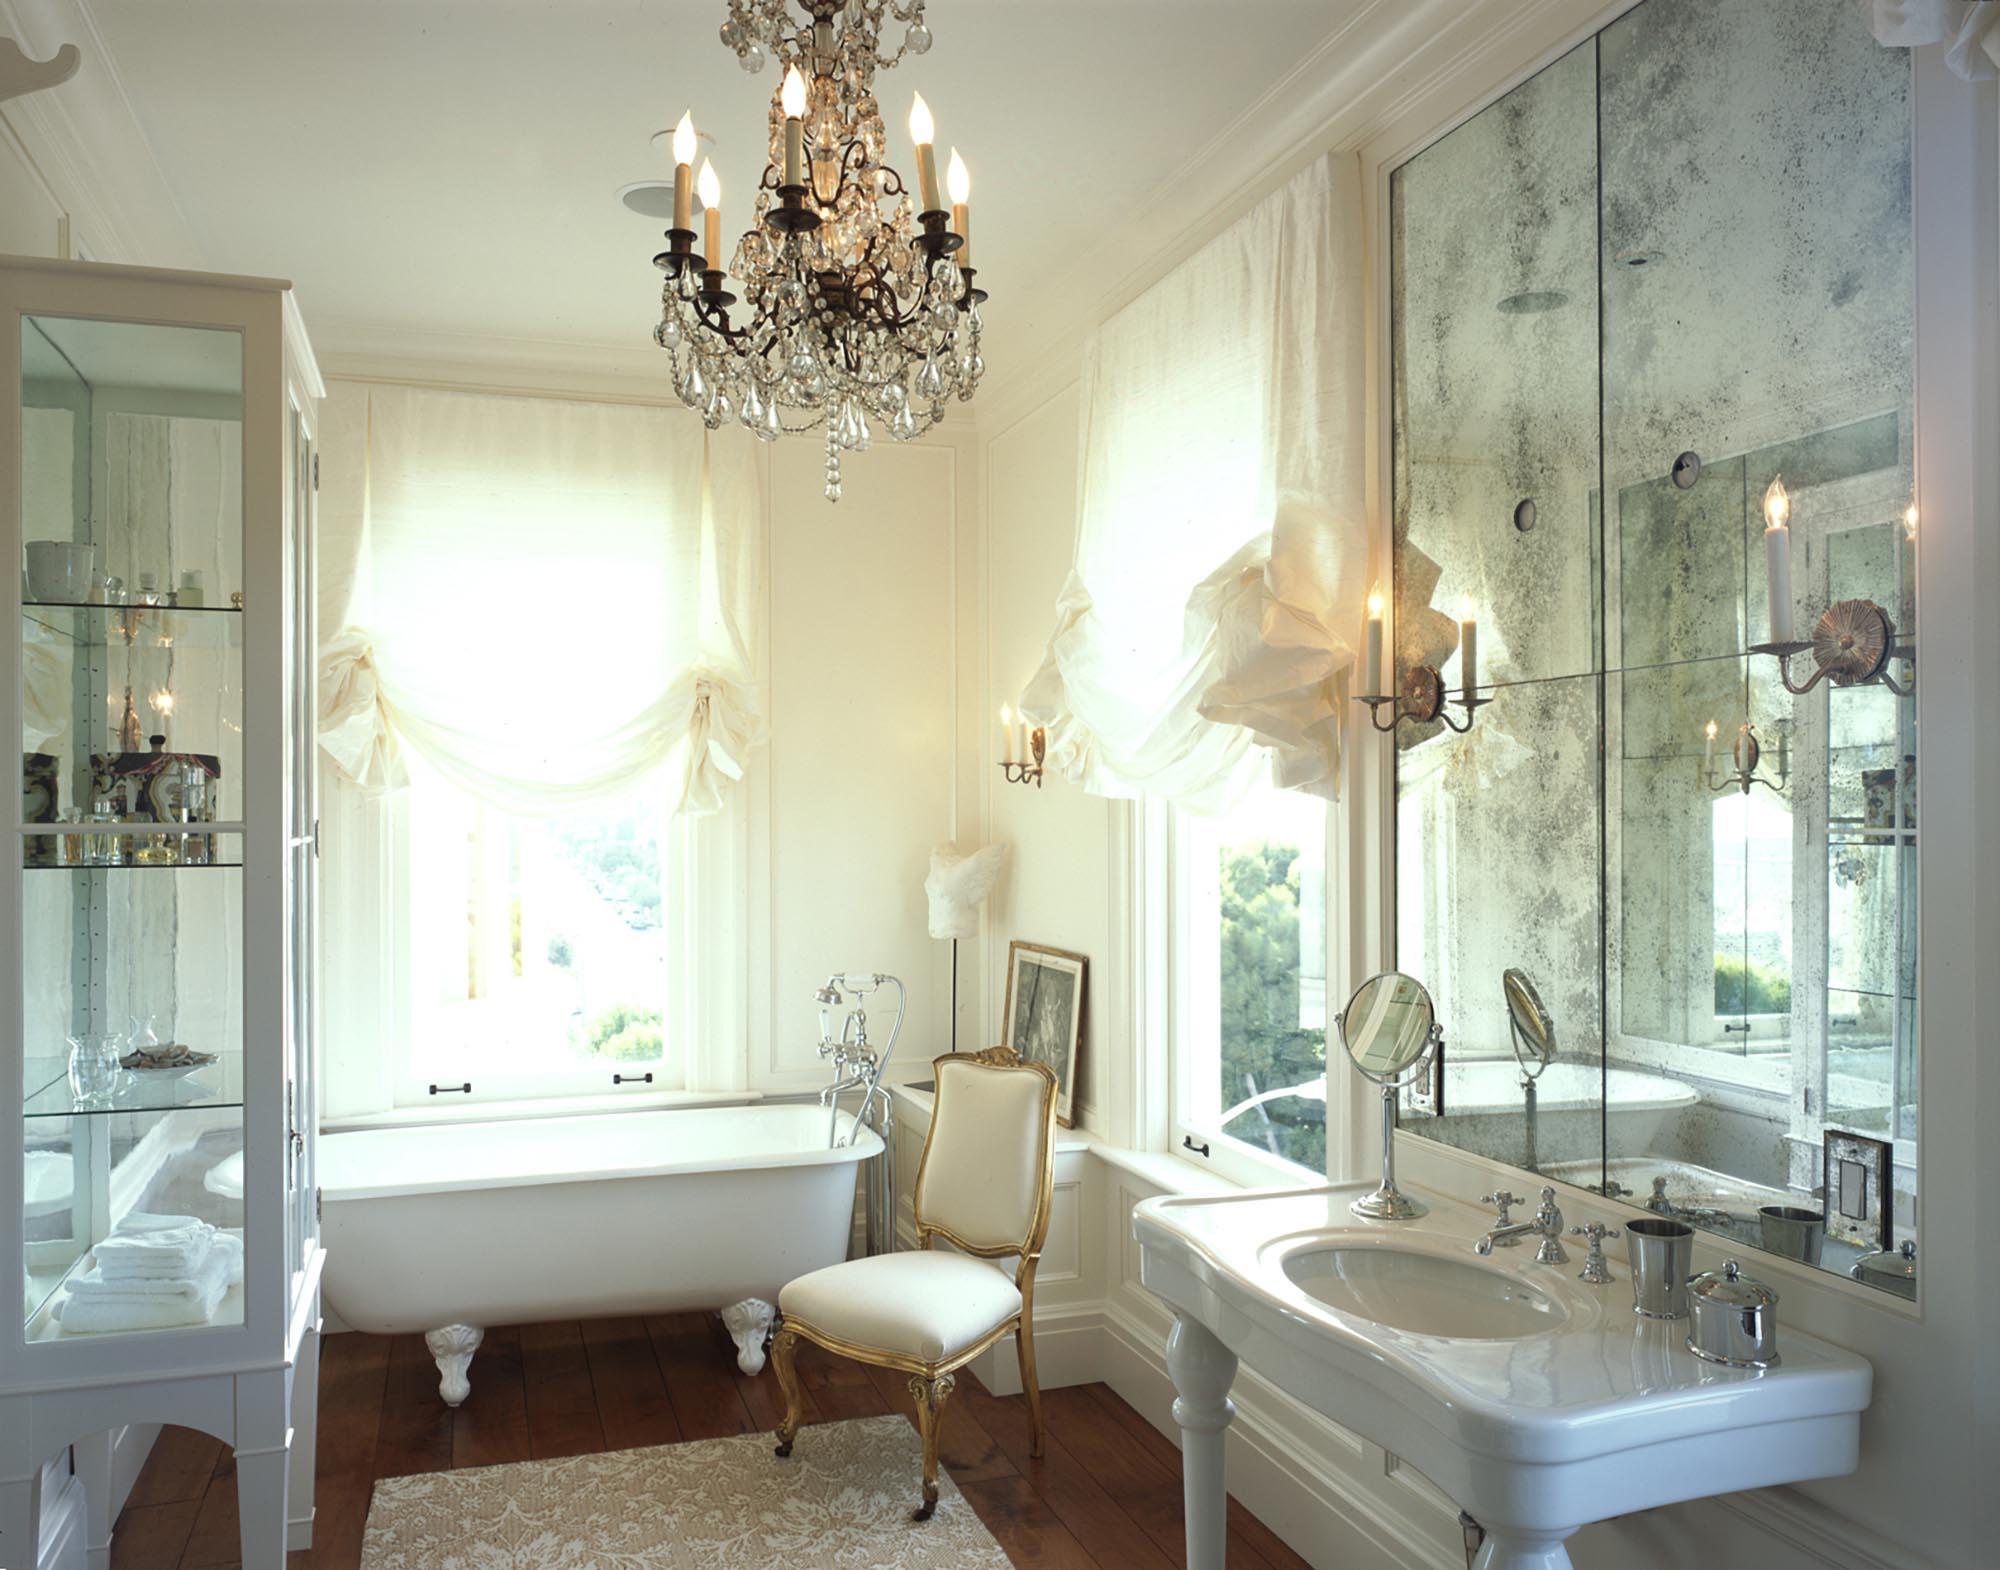 Pacific Heights Residence Bath